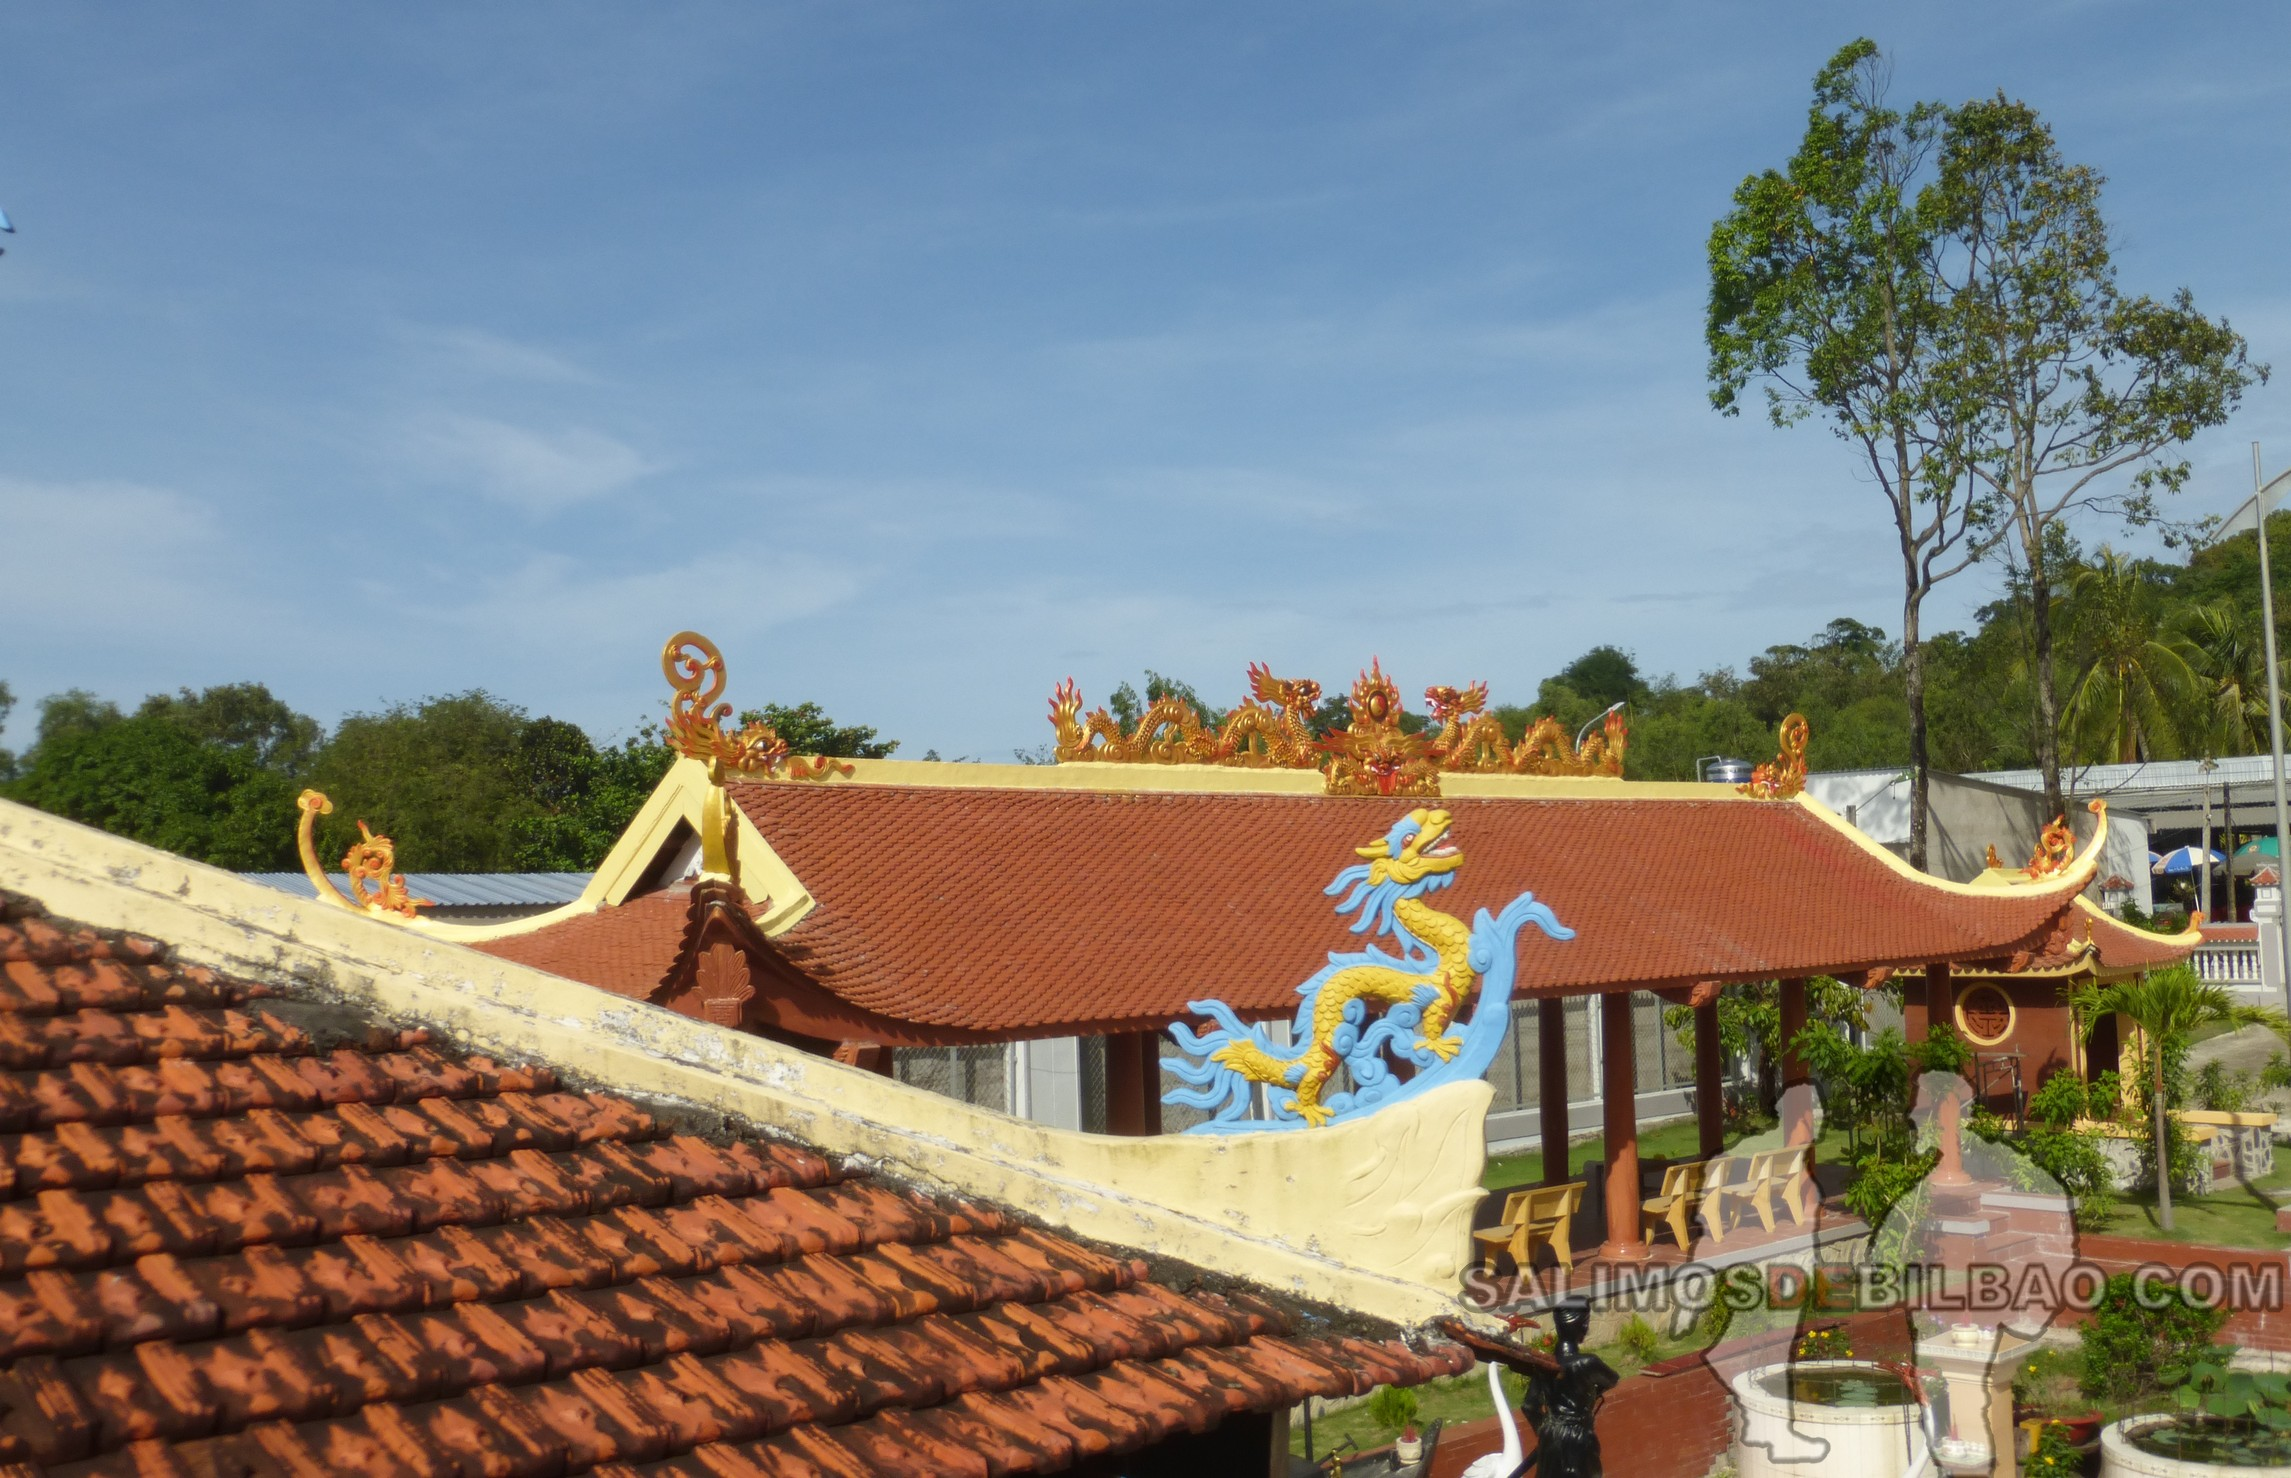 0132. Pagoda Dinh Nguyen Trung Truc, Noreste de Phu Quoc